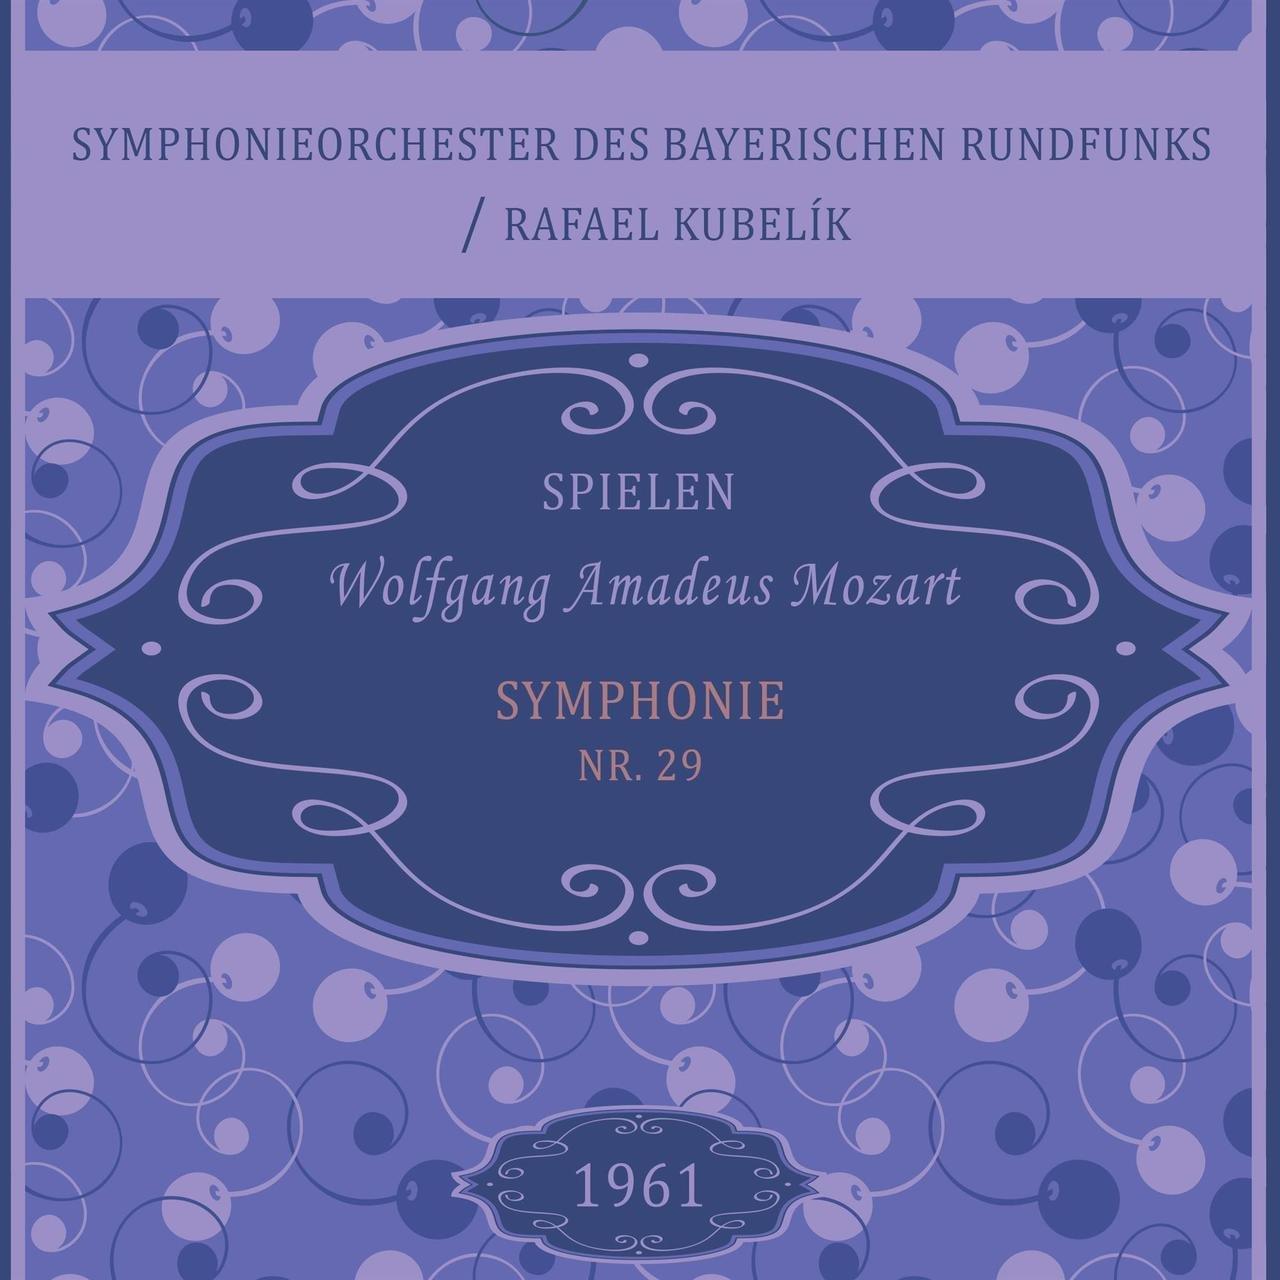 Franz schubert symphonie 8 5